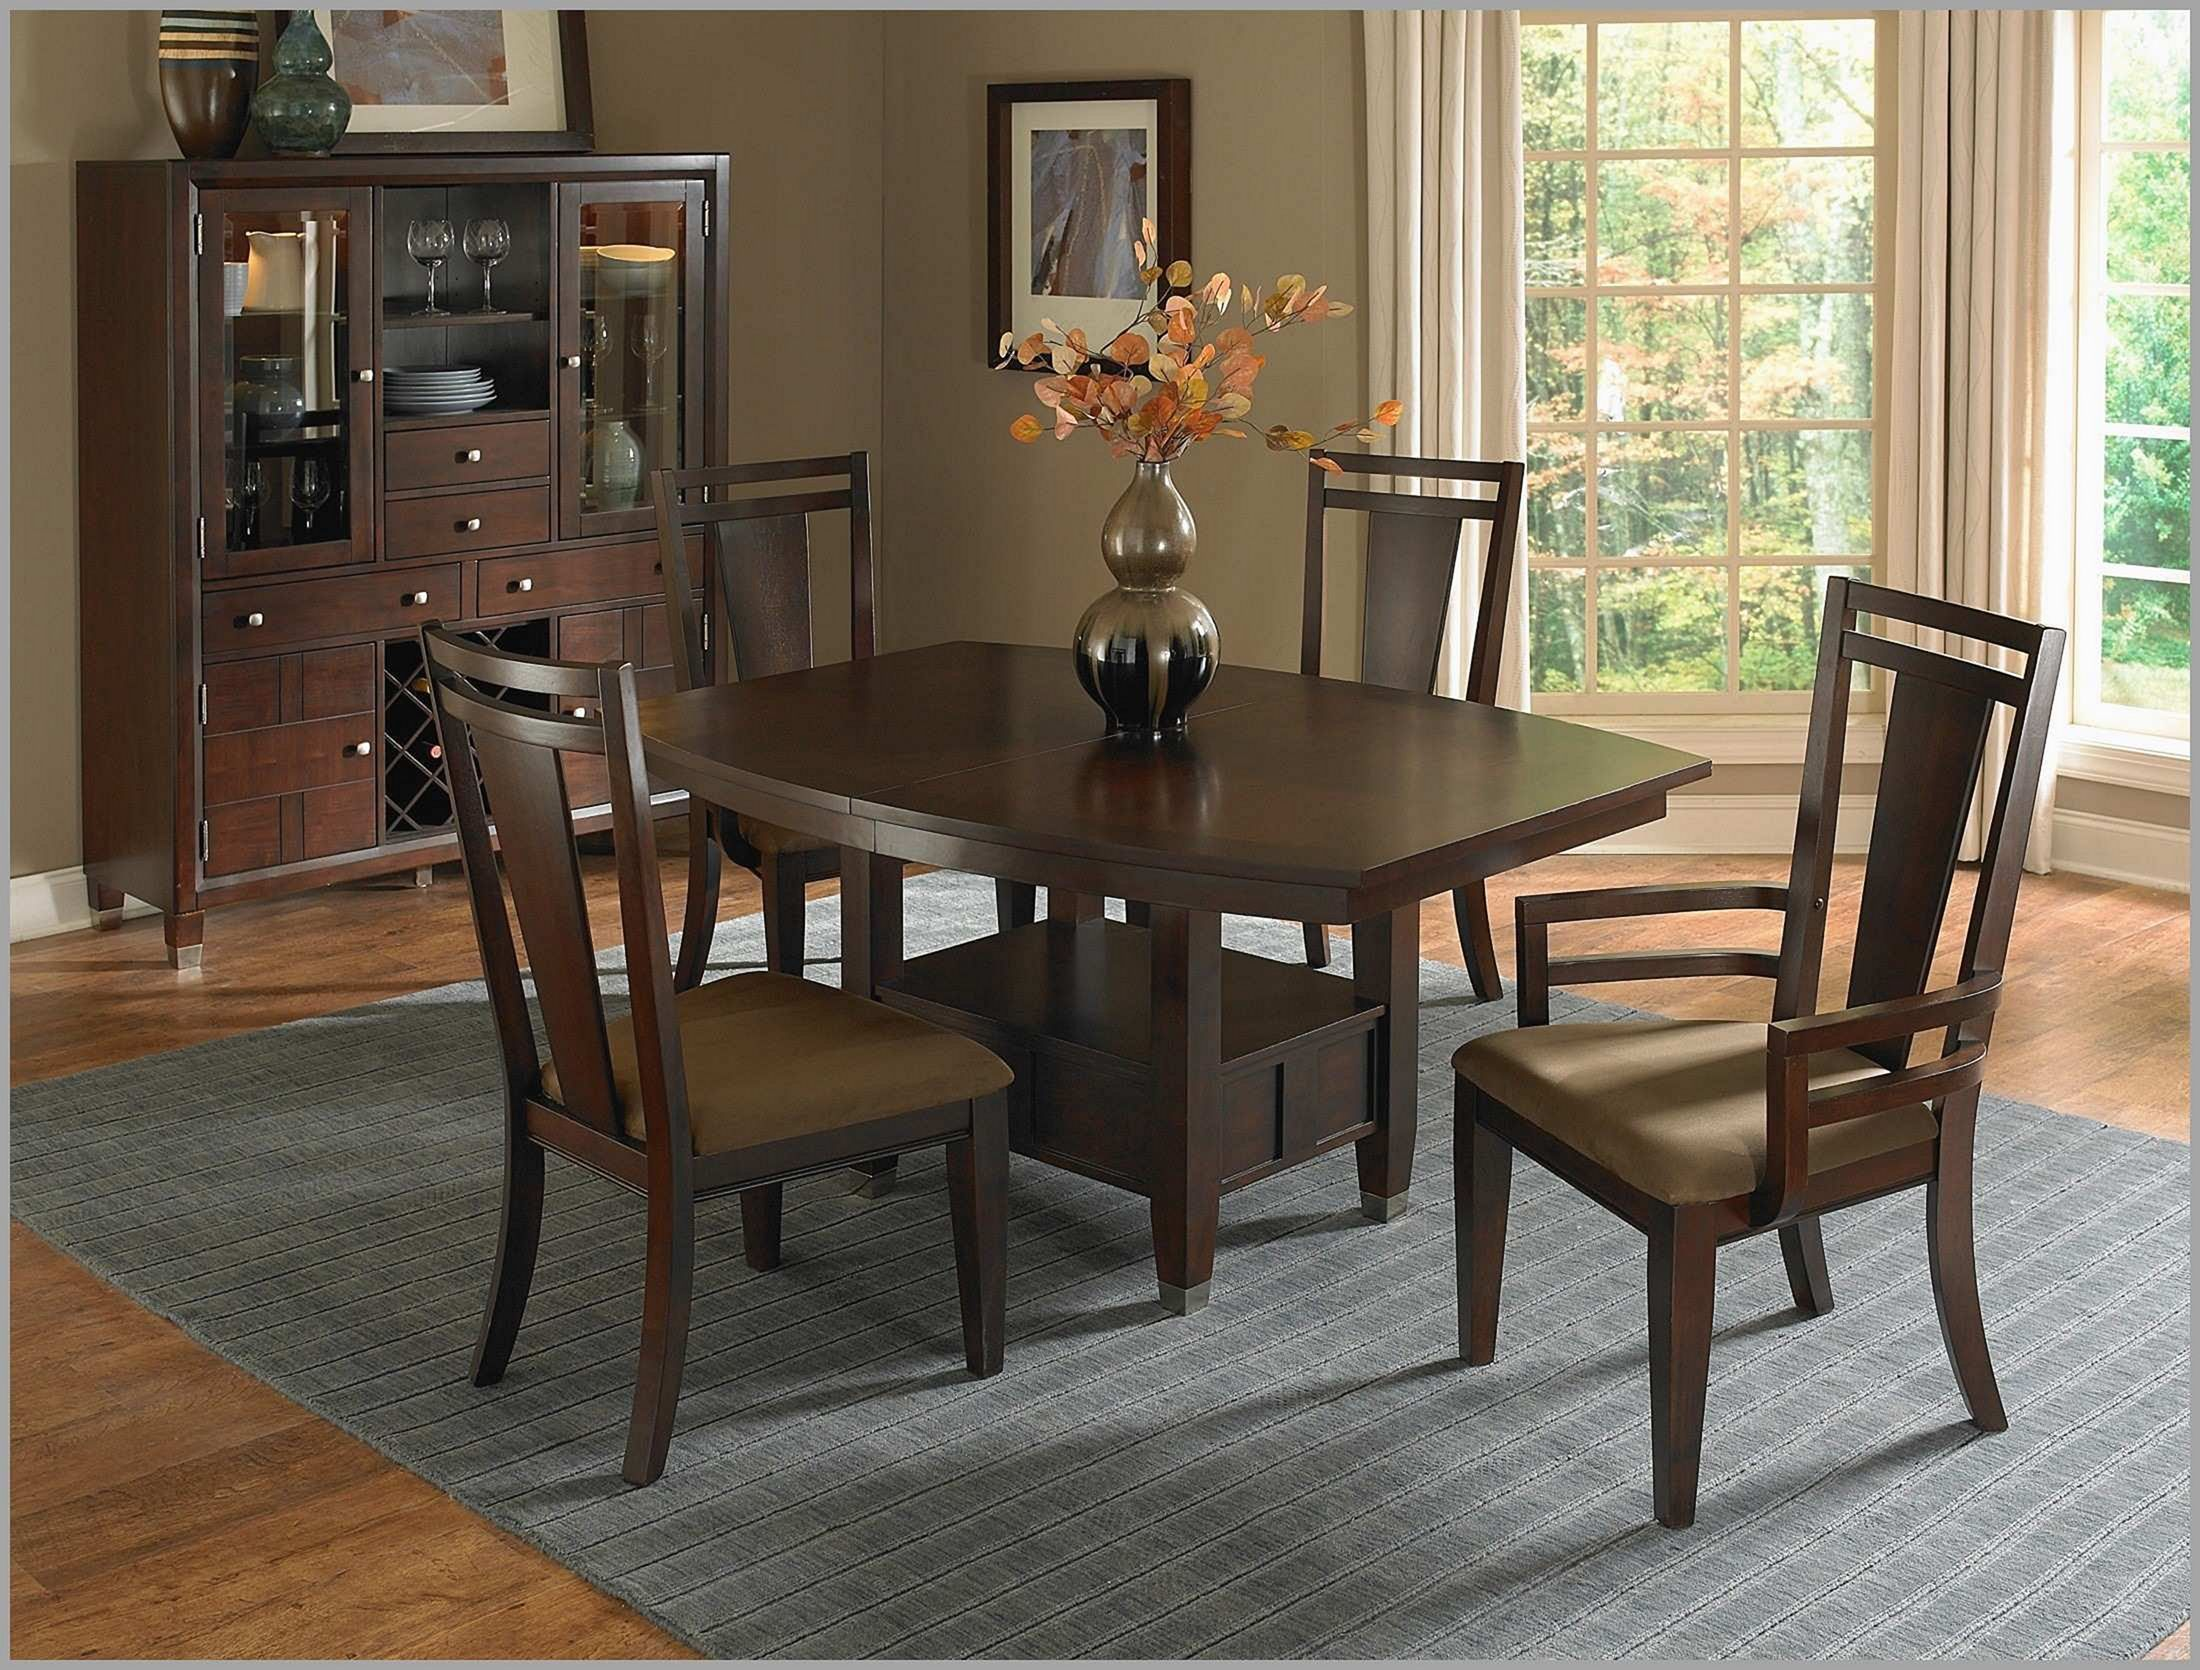 15 Lovely Wood Dining Room Design And Decor Ideas Freshouz Com Dining Room Furniture Sets Dining Room Furniture Collections Dining Room Design